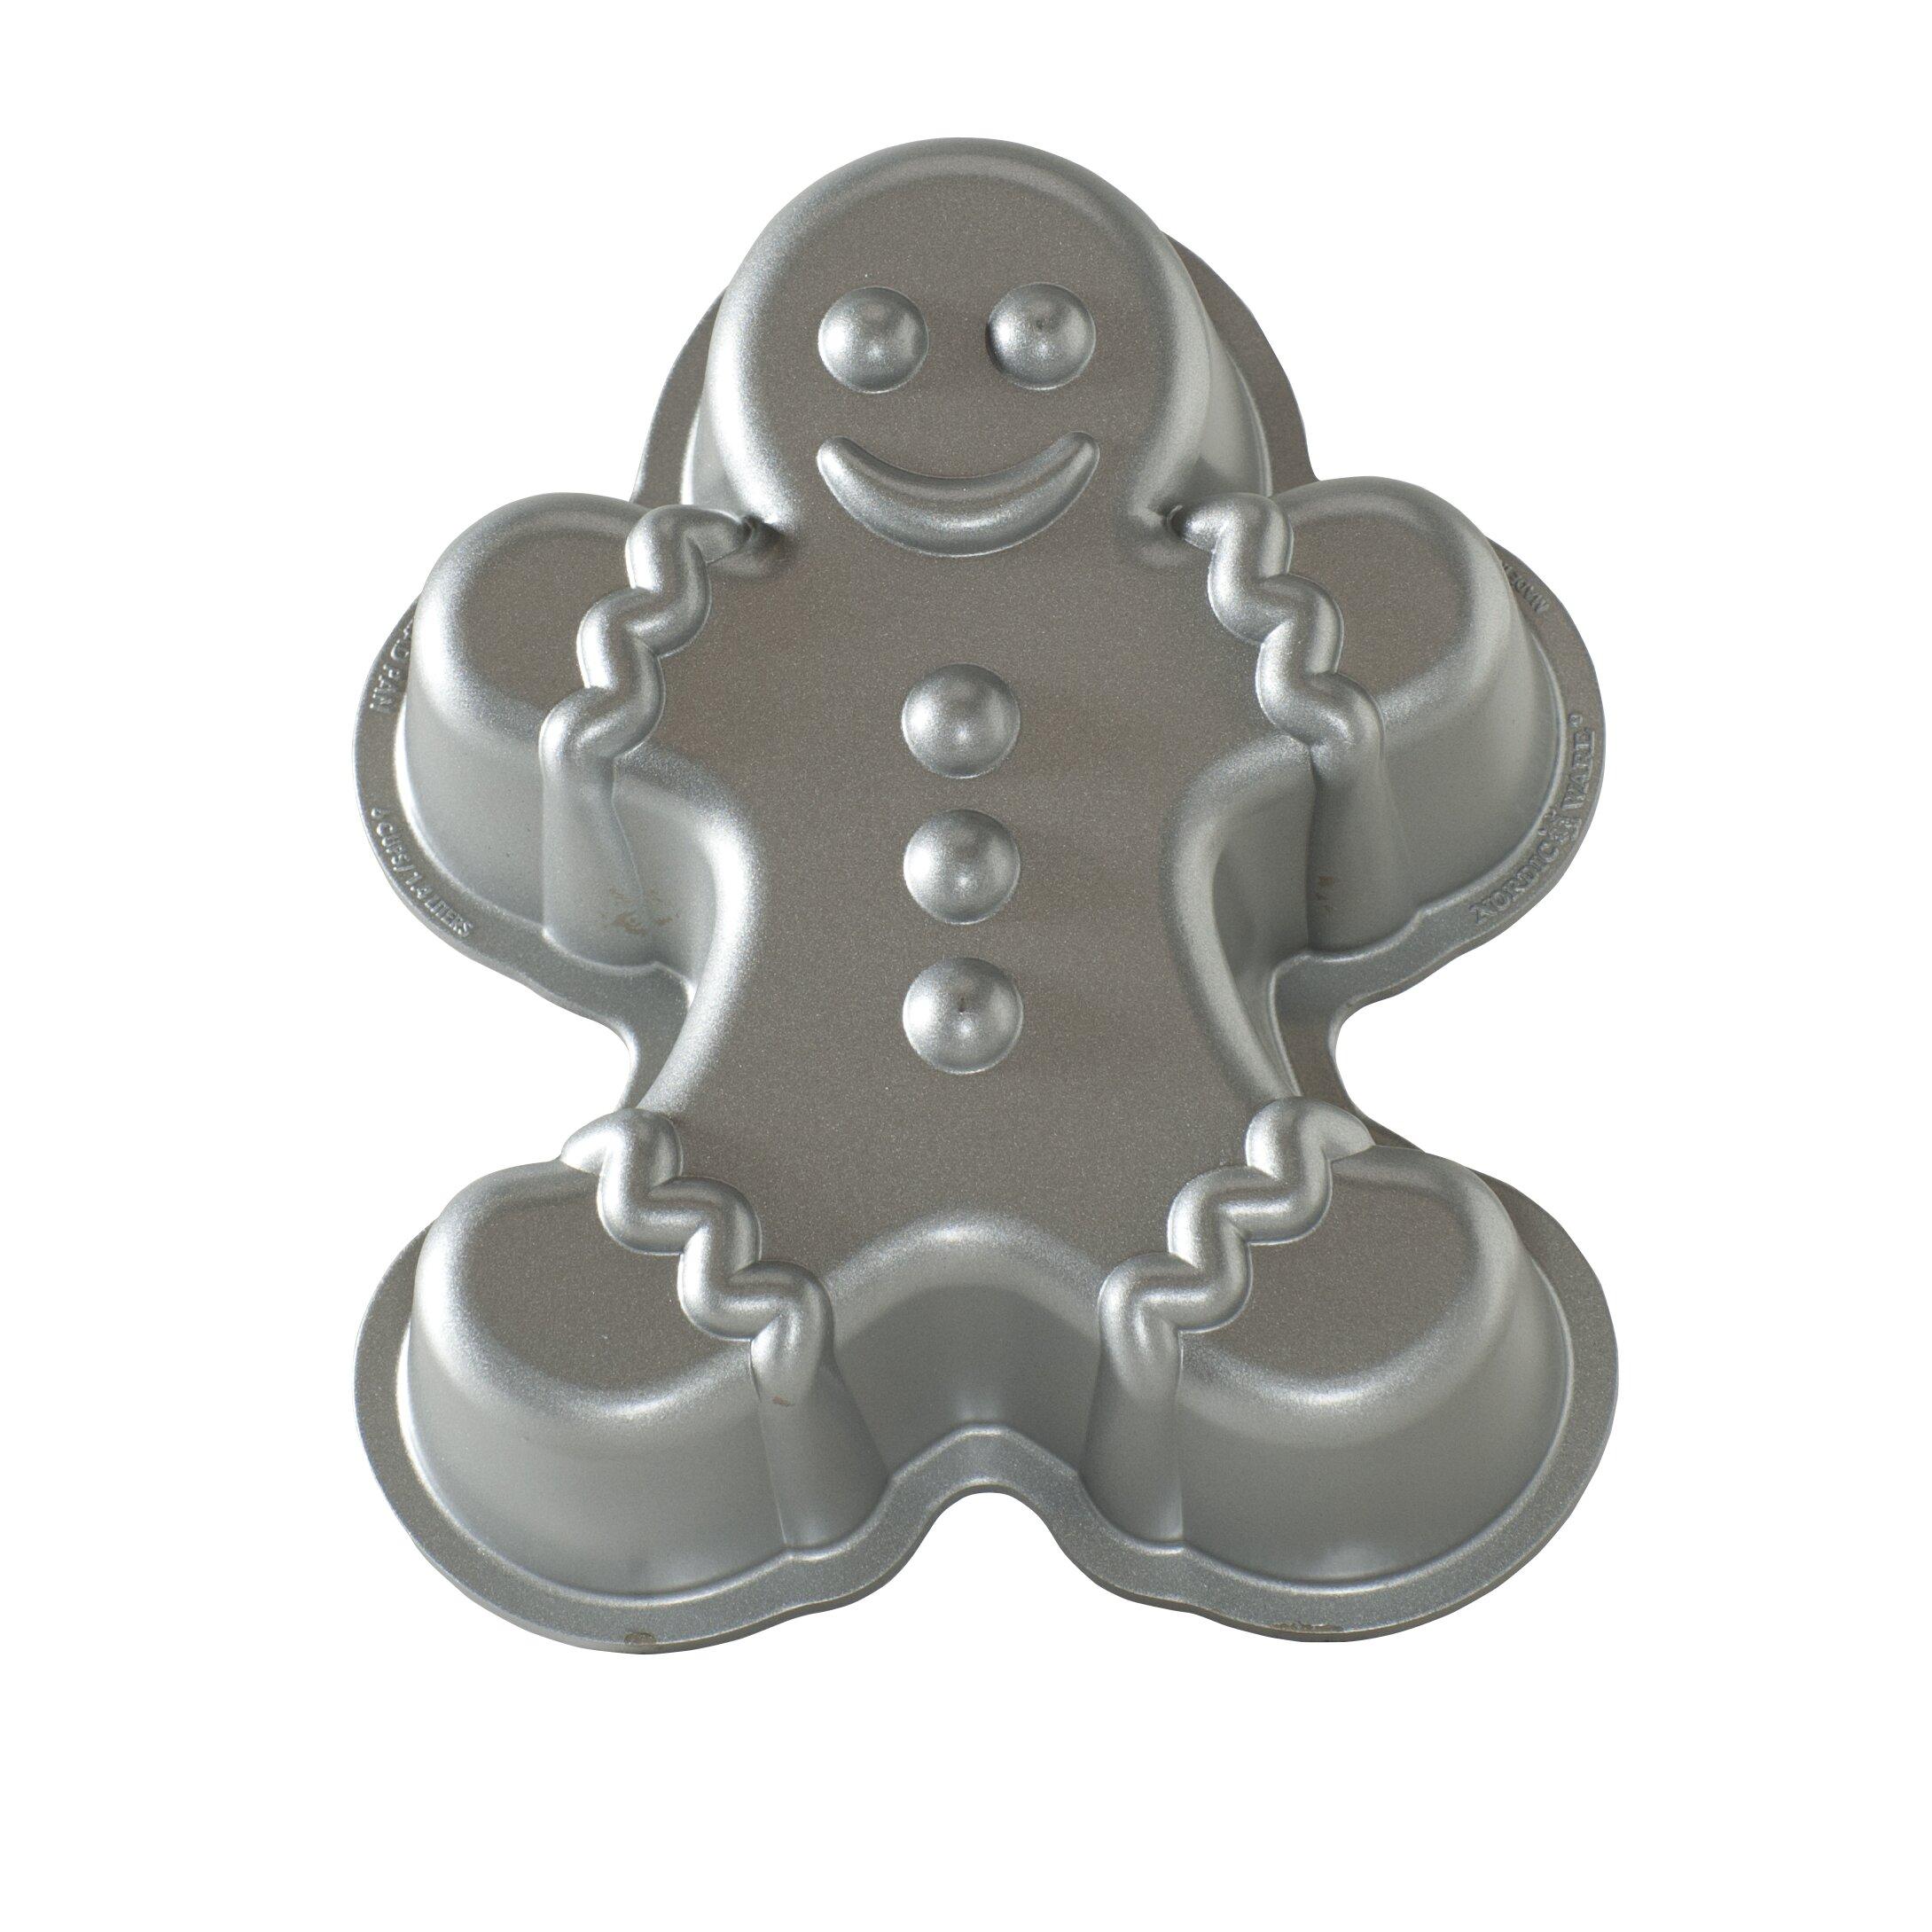 Gingerbread Kitchen Curtains The Holiday Aisle Gingerbread Man Cake Pan Reviews Wayfair